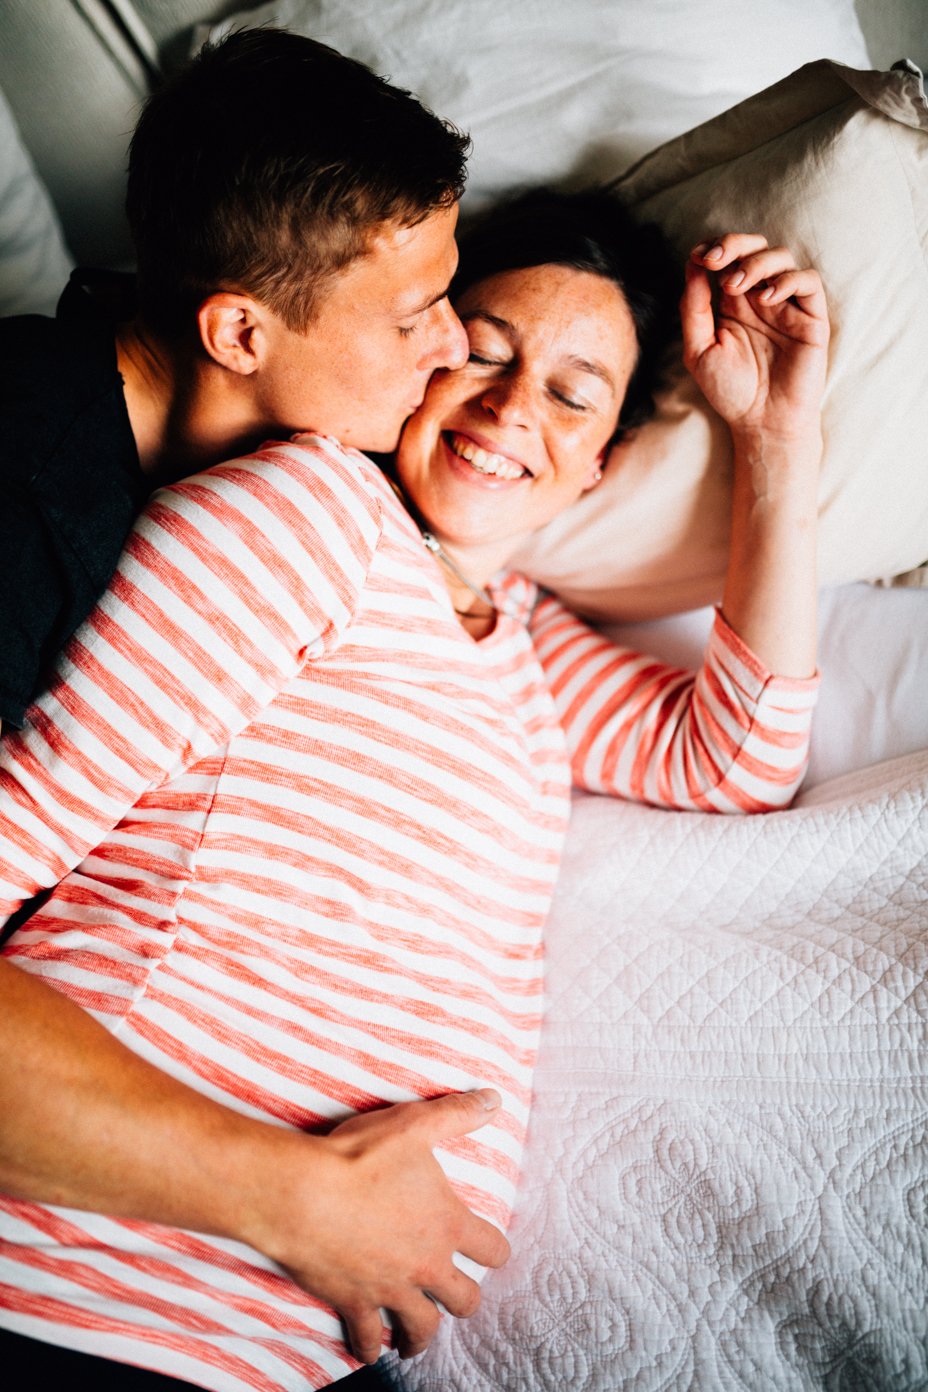 Babybauchshoot-Kassel-Inka Englisch Photography-Schwangerschaft-Foto-Fotoshoot-Babybauch-Pregnancy-Homestory-zuhause-14